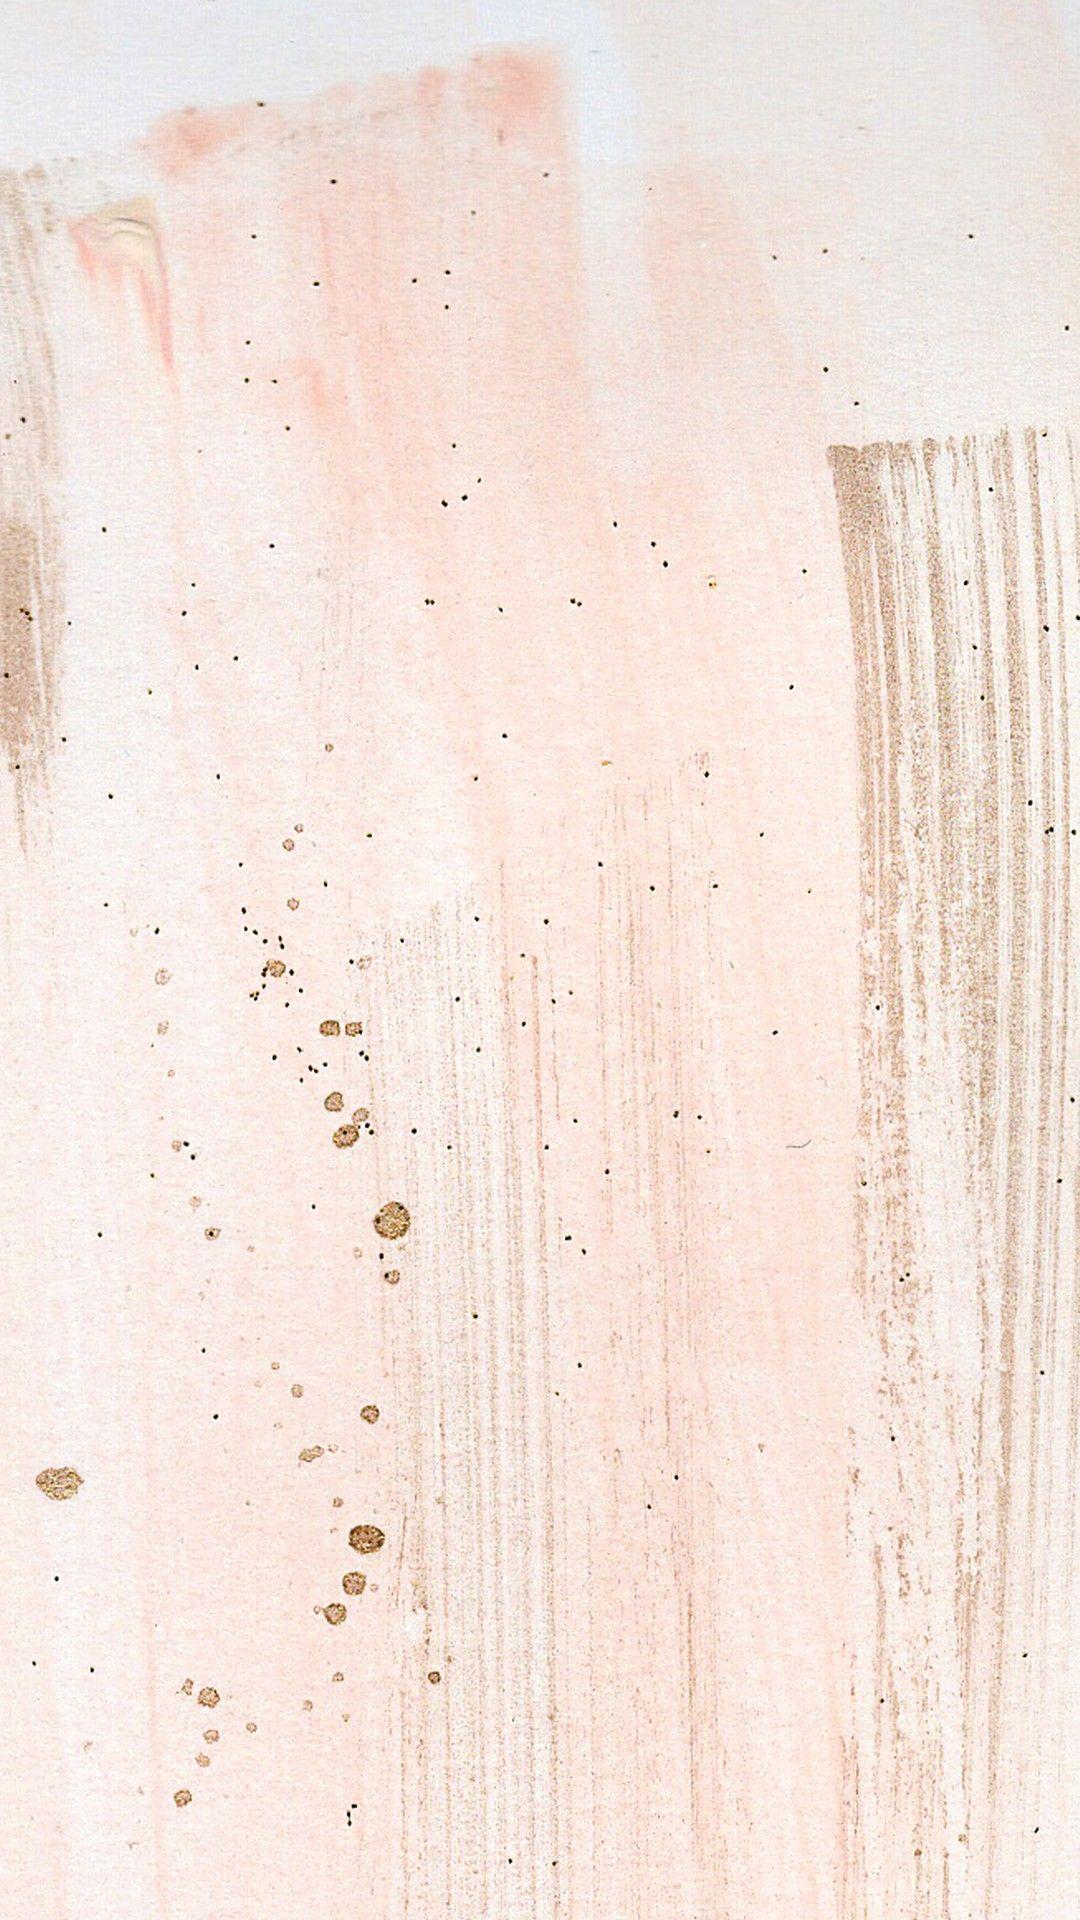 Iphone X Wallpaper Cute Gold Rose Best Iphone Wallpaper